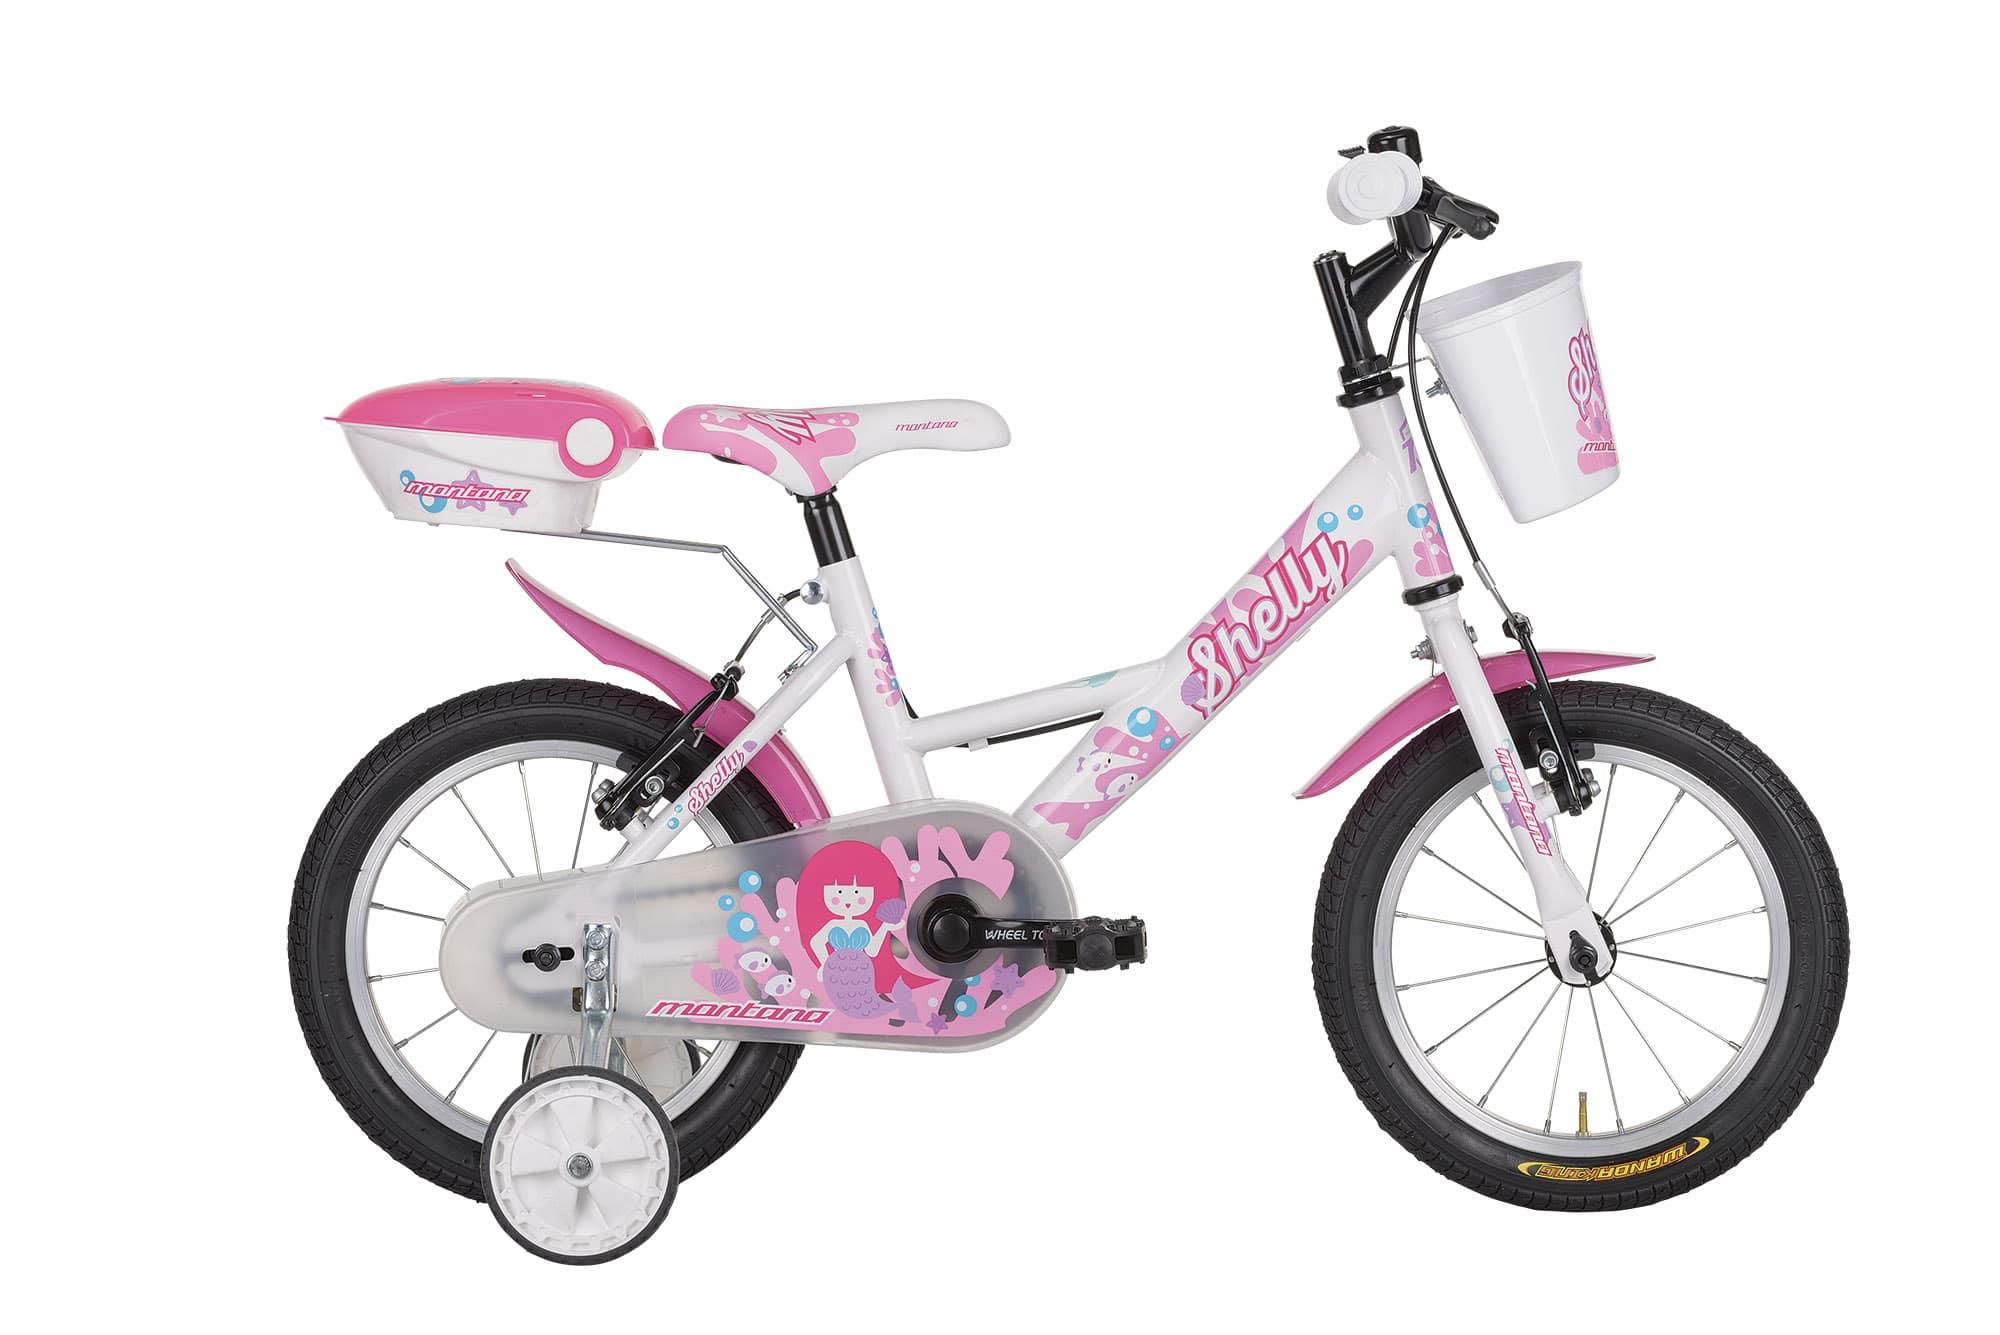 bici bambina Montana shelly 14